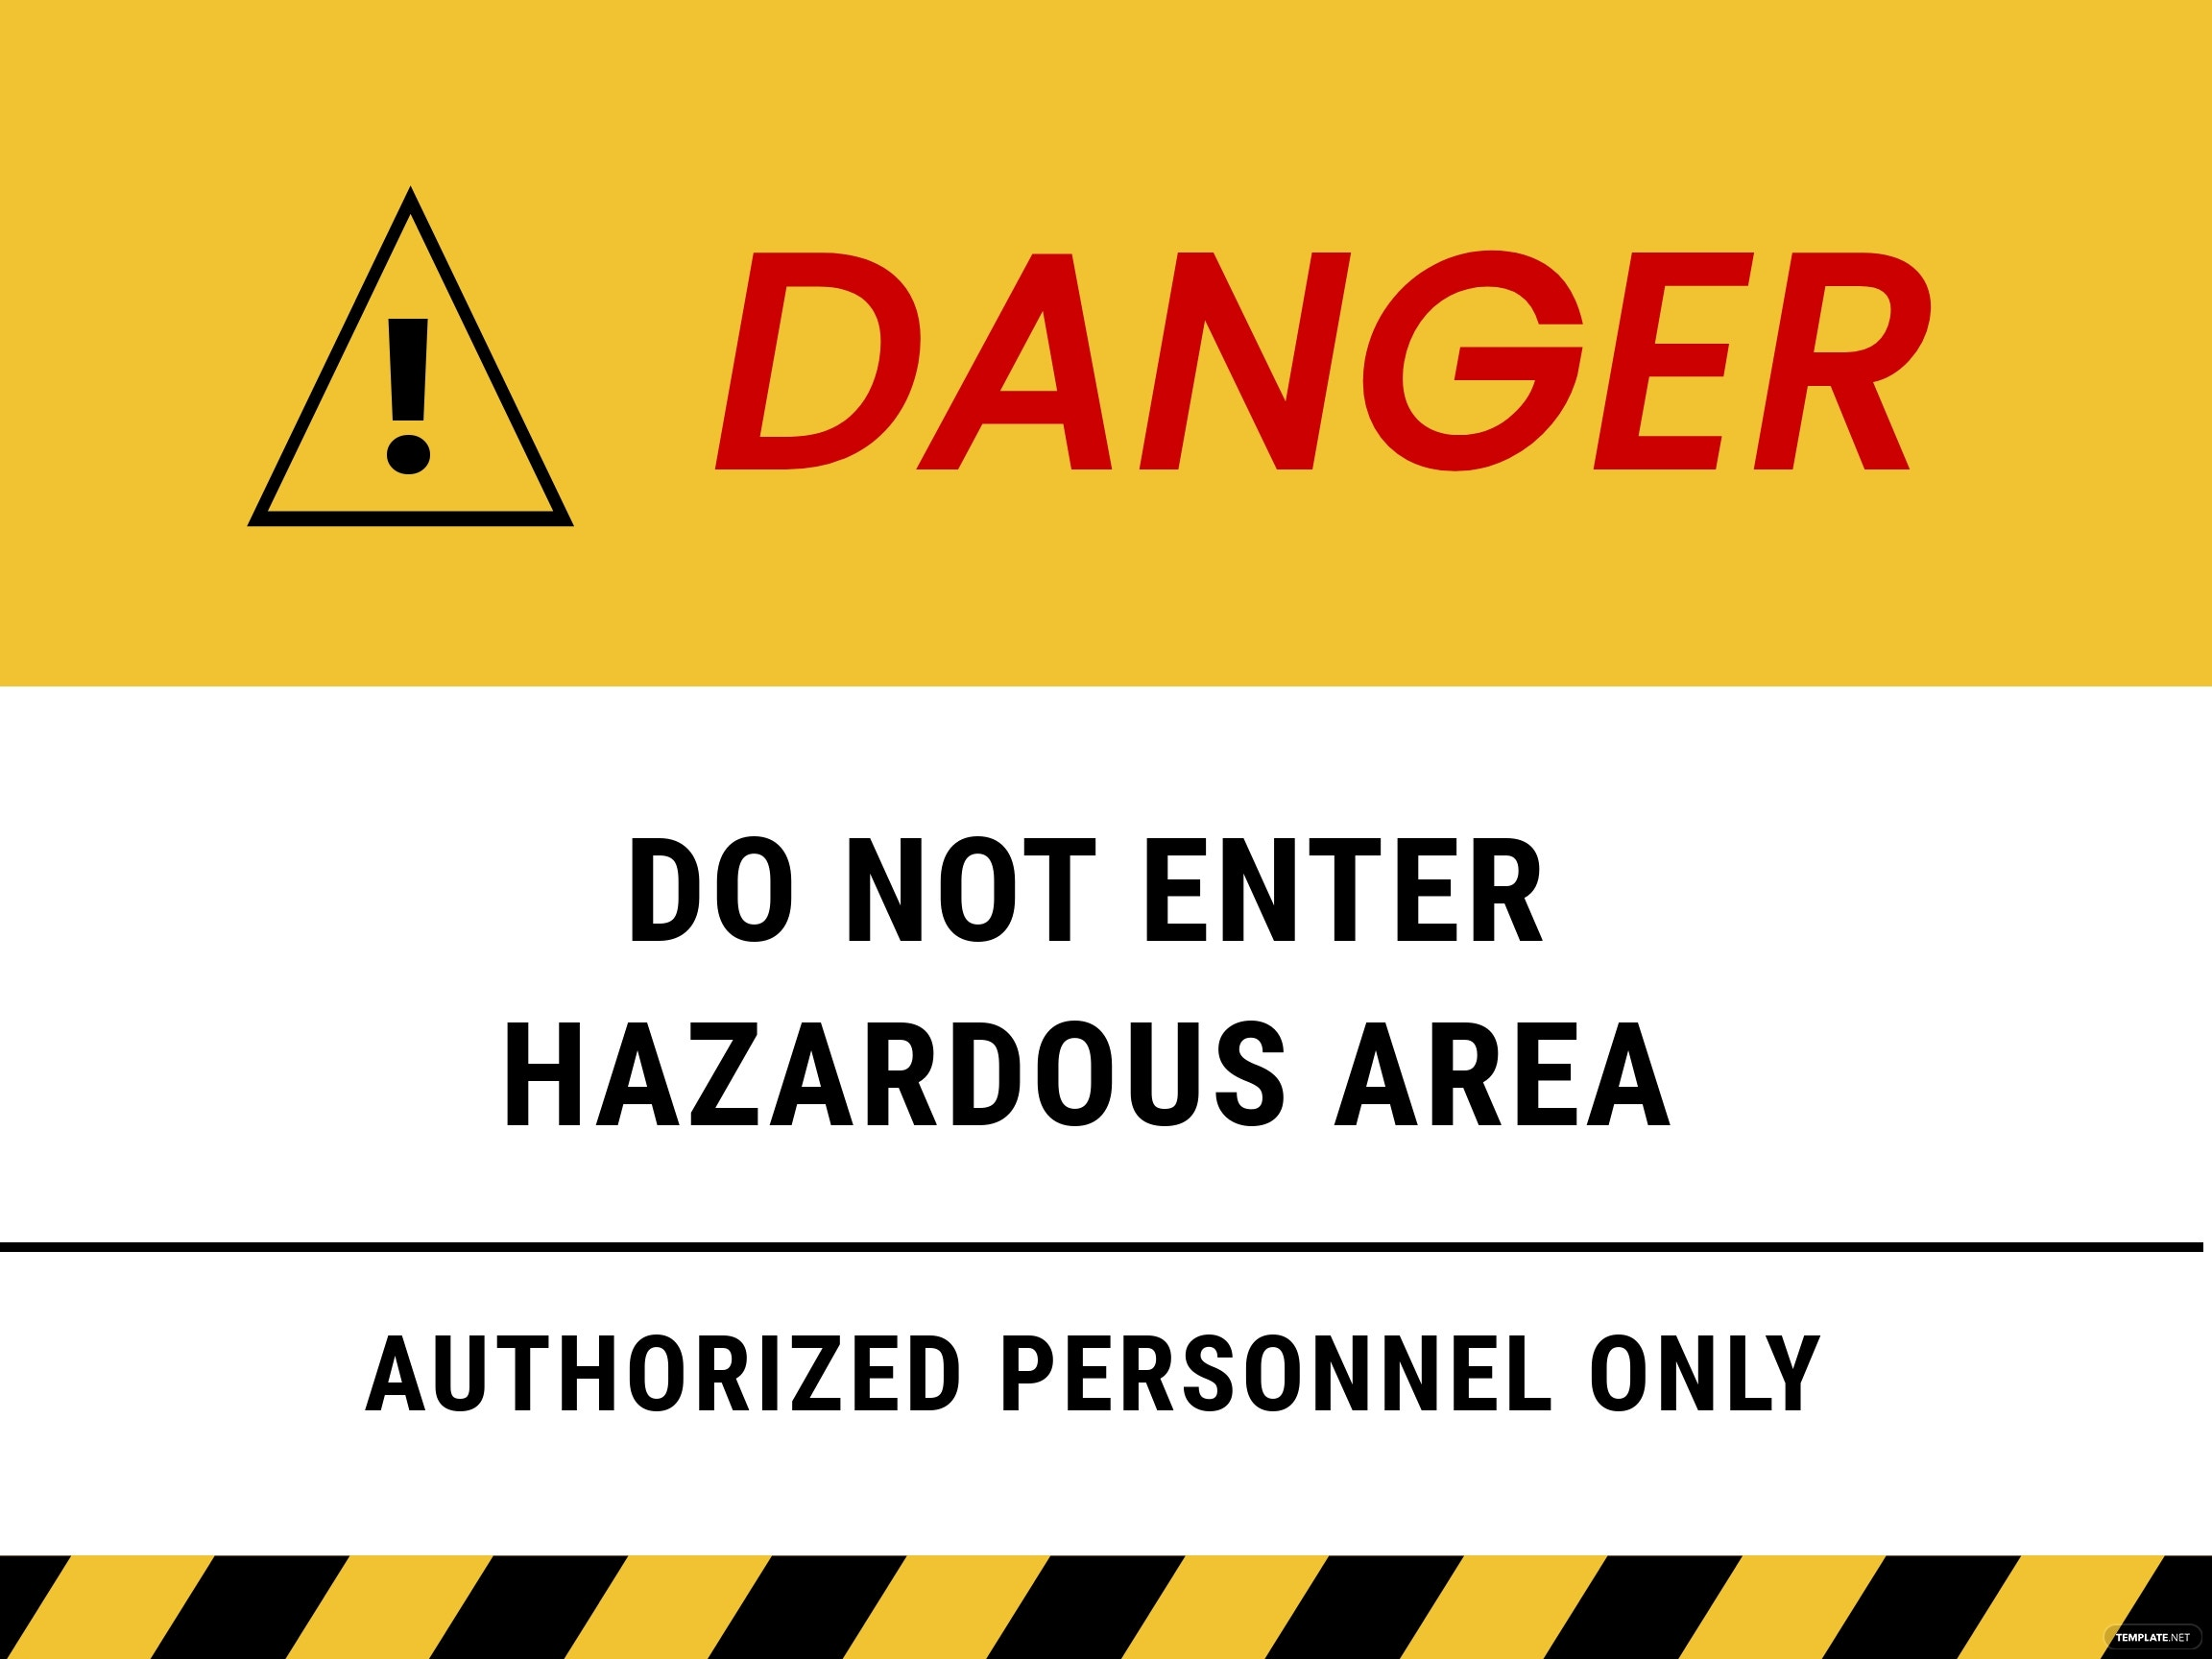 Danger Hazard Area Do Not Enter Stanchion Sign Template.jpe